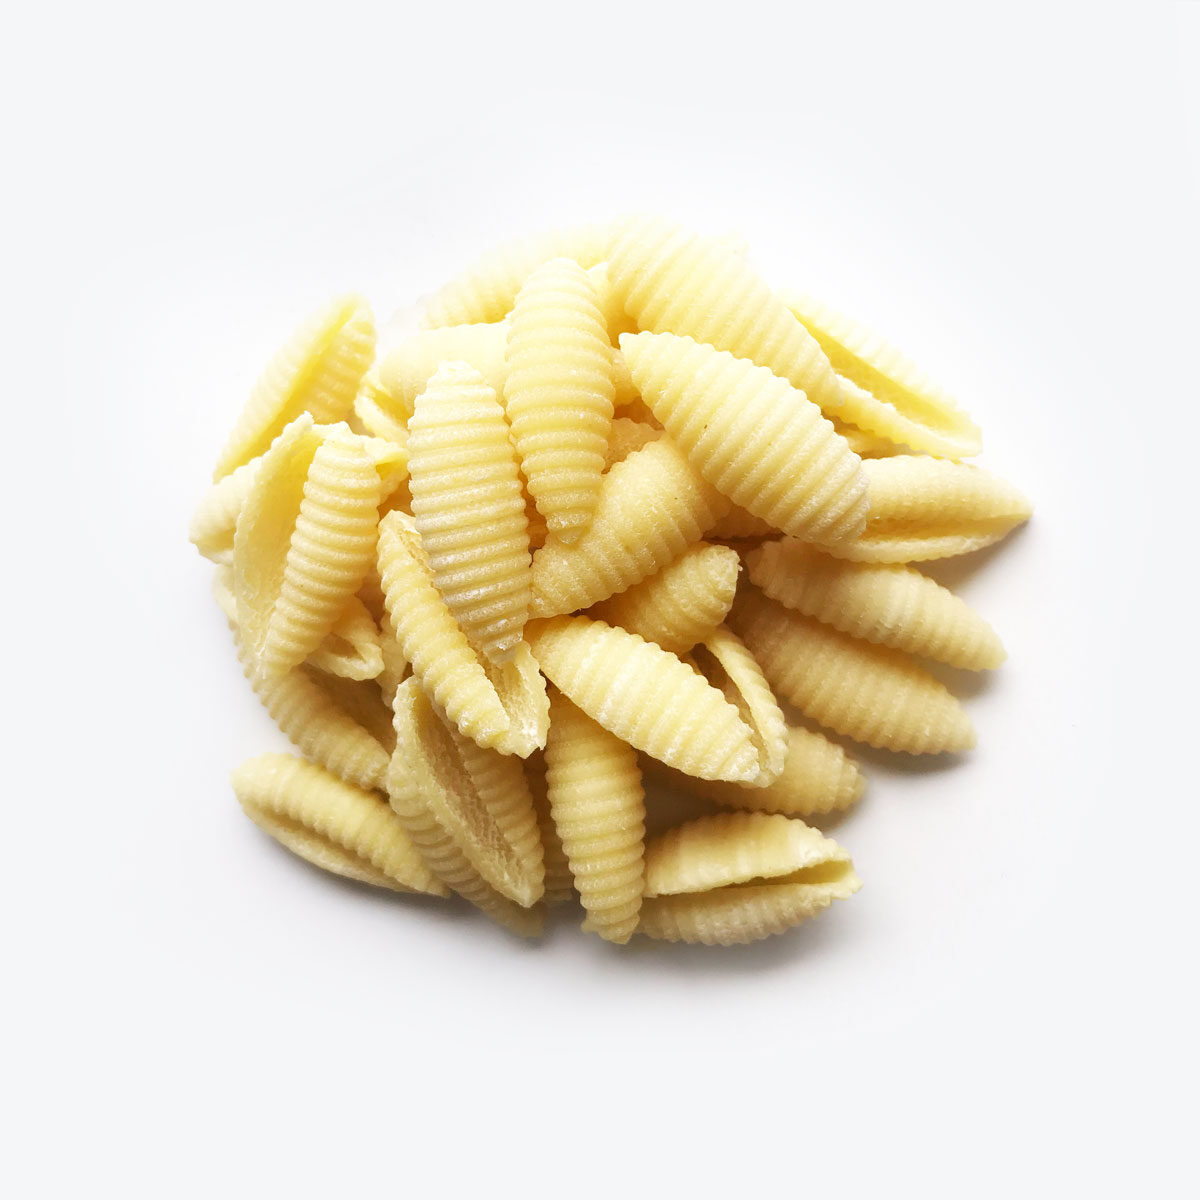 F632-Gnocco_sardo_bombato_pasta_